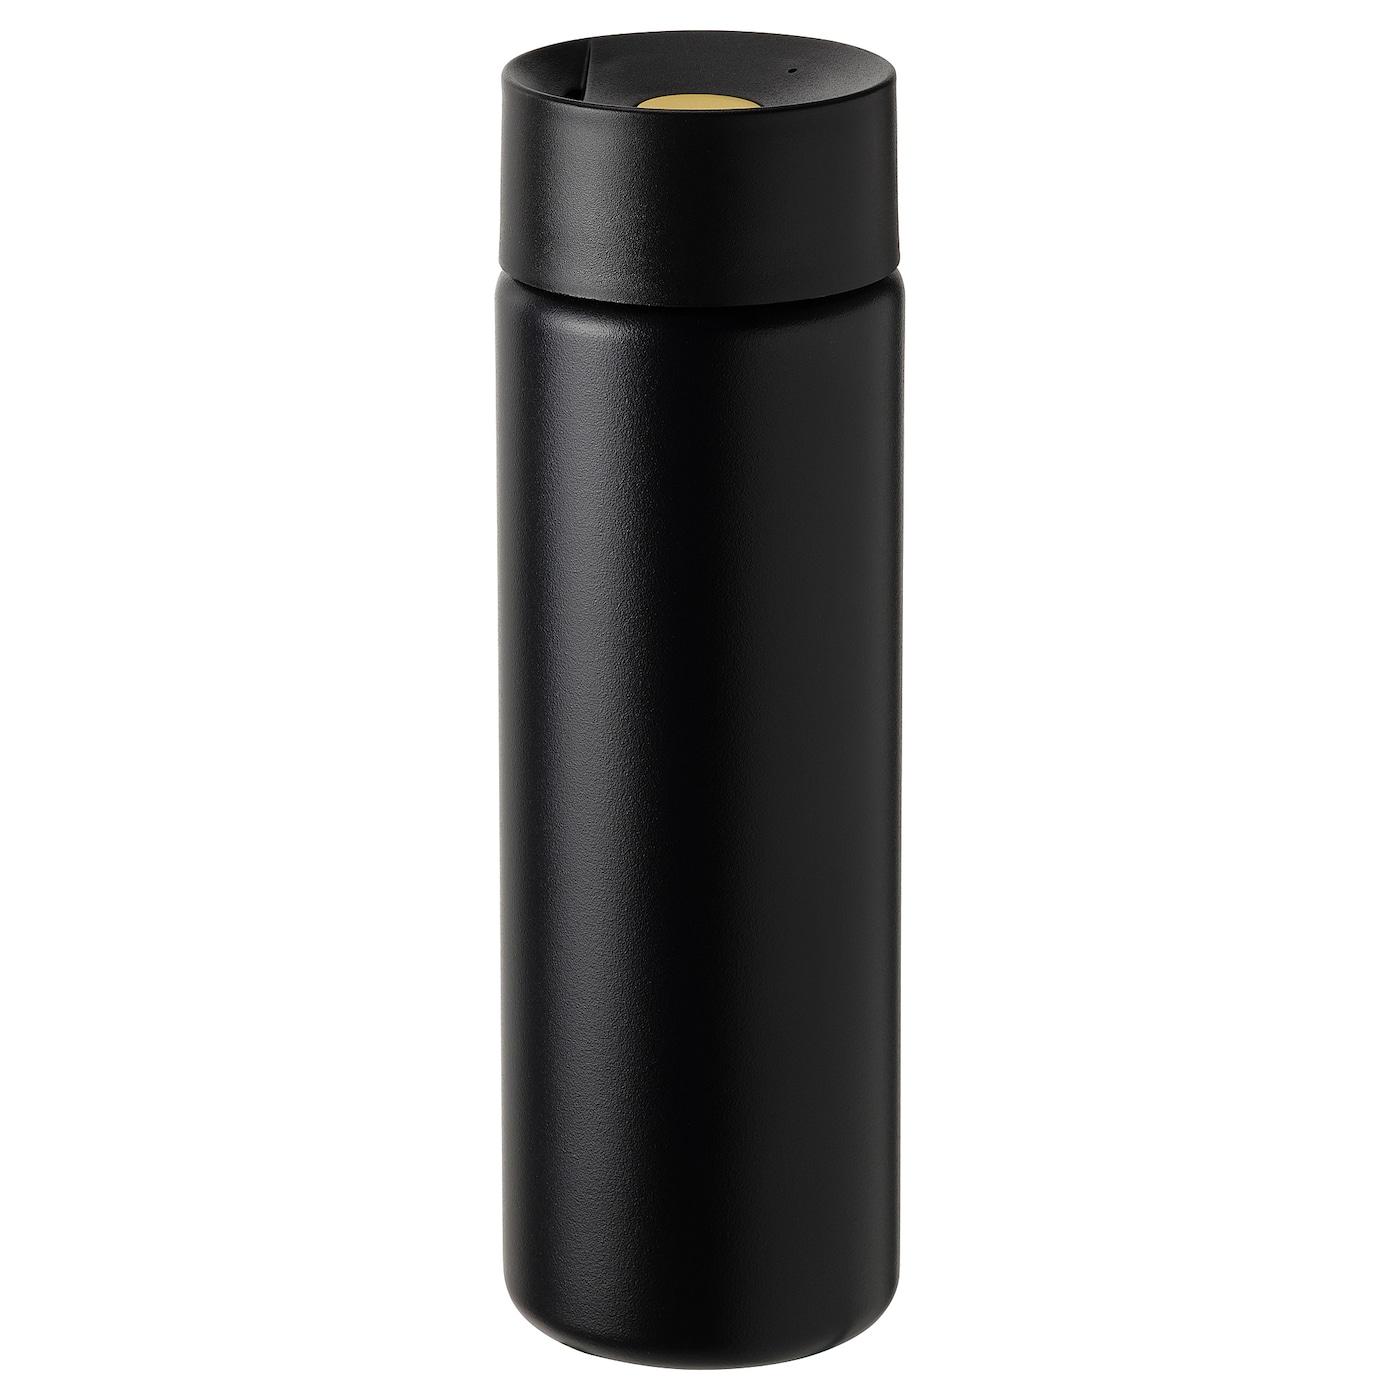 UNDERSÖKA Insulated travel mug - black 0.4 l